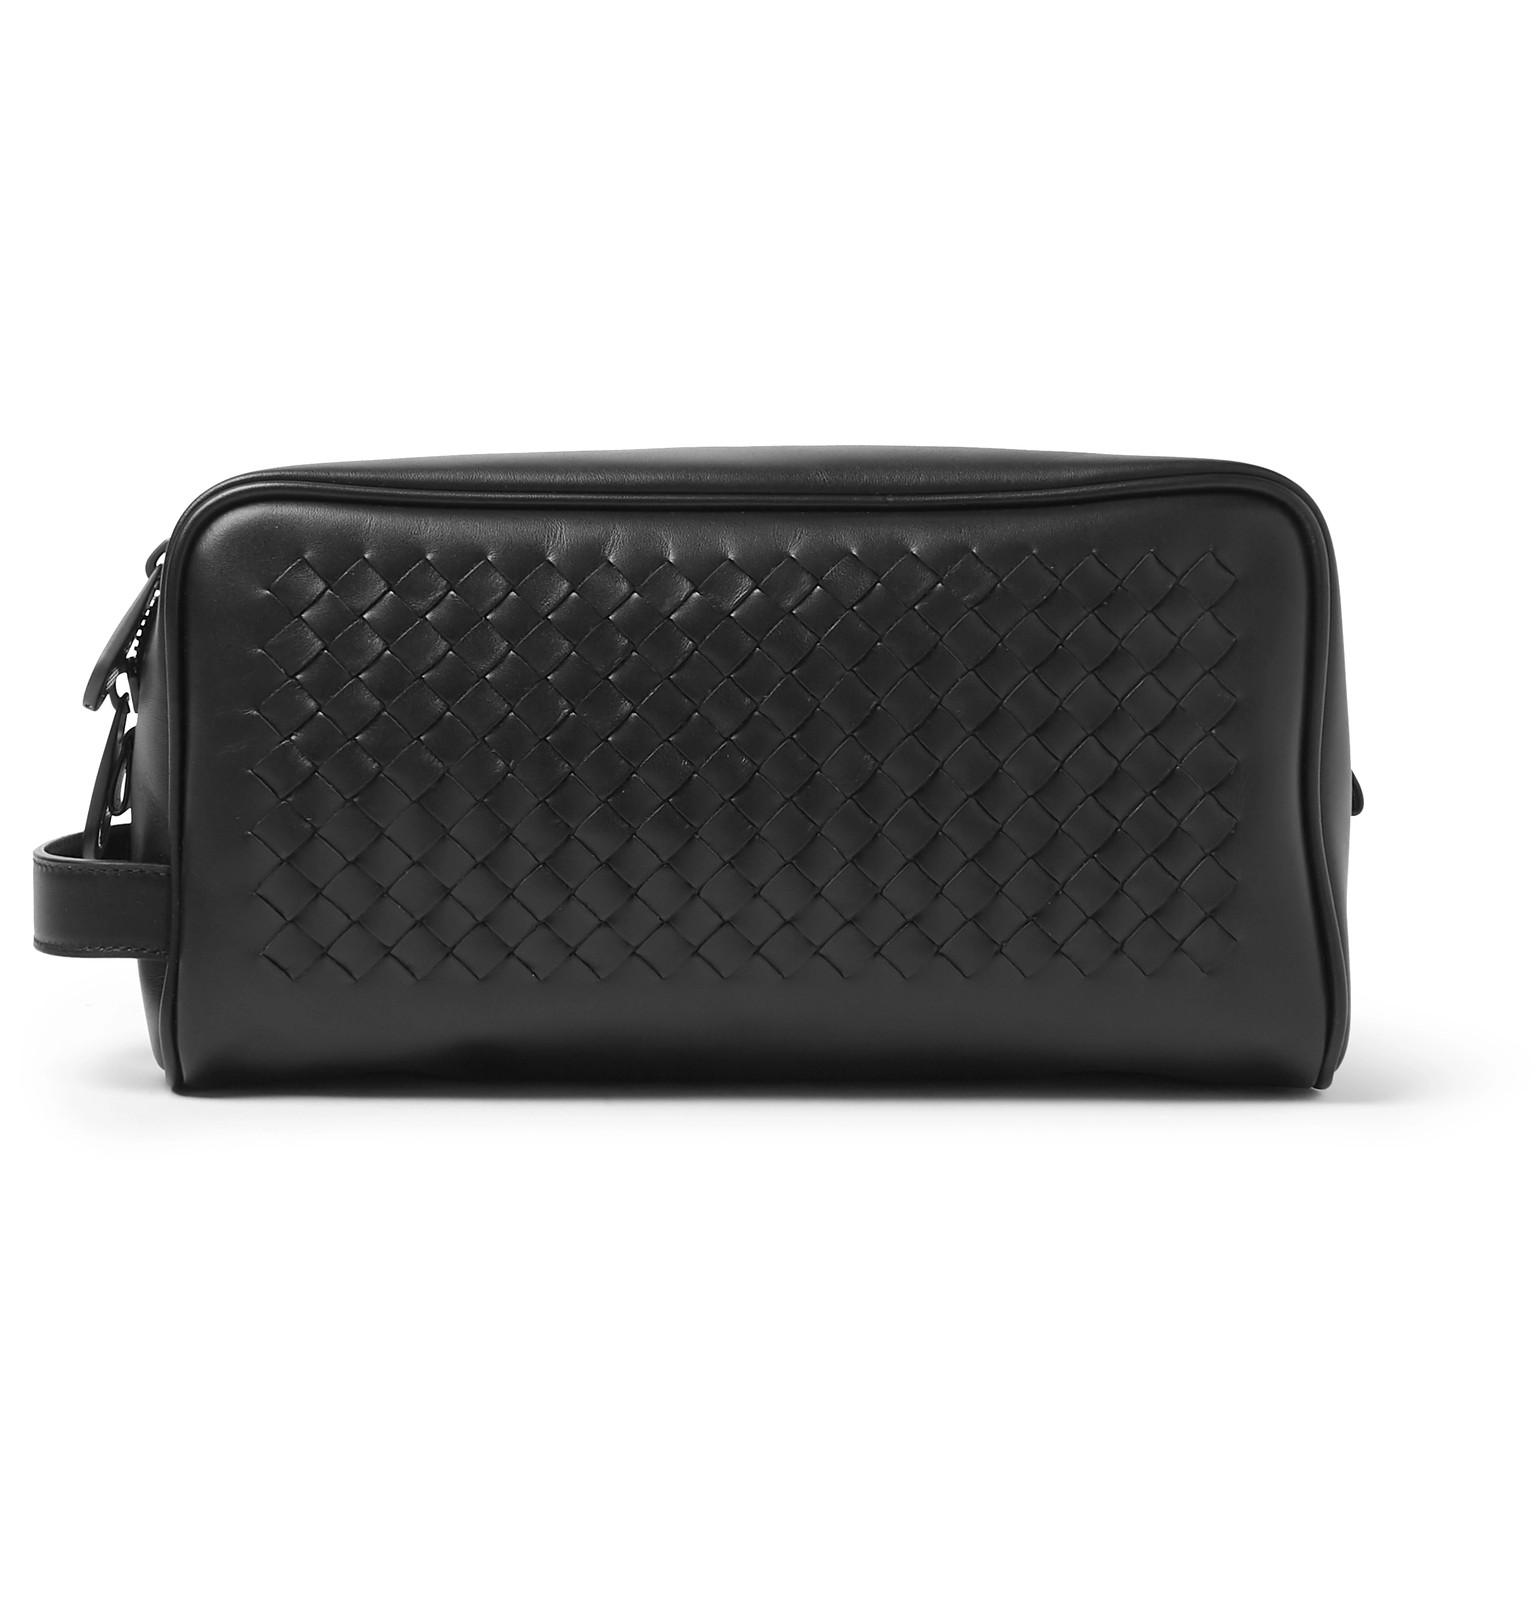 1619e1f42be1 Bottega Veneta - Intrecciato Leather Wash Bag